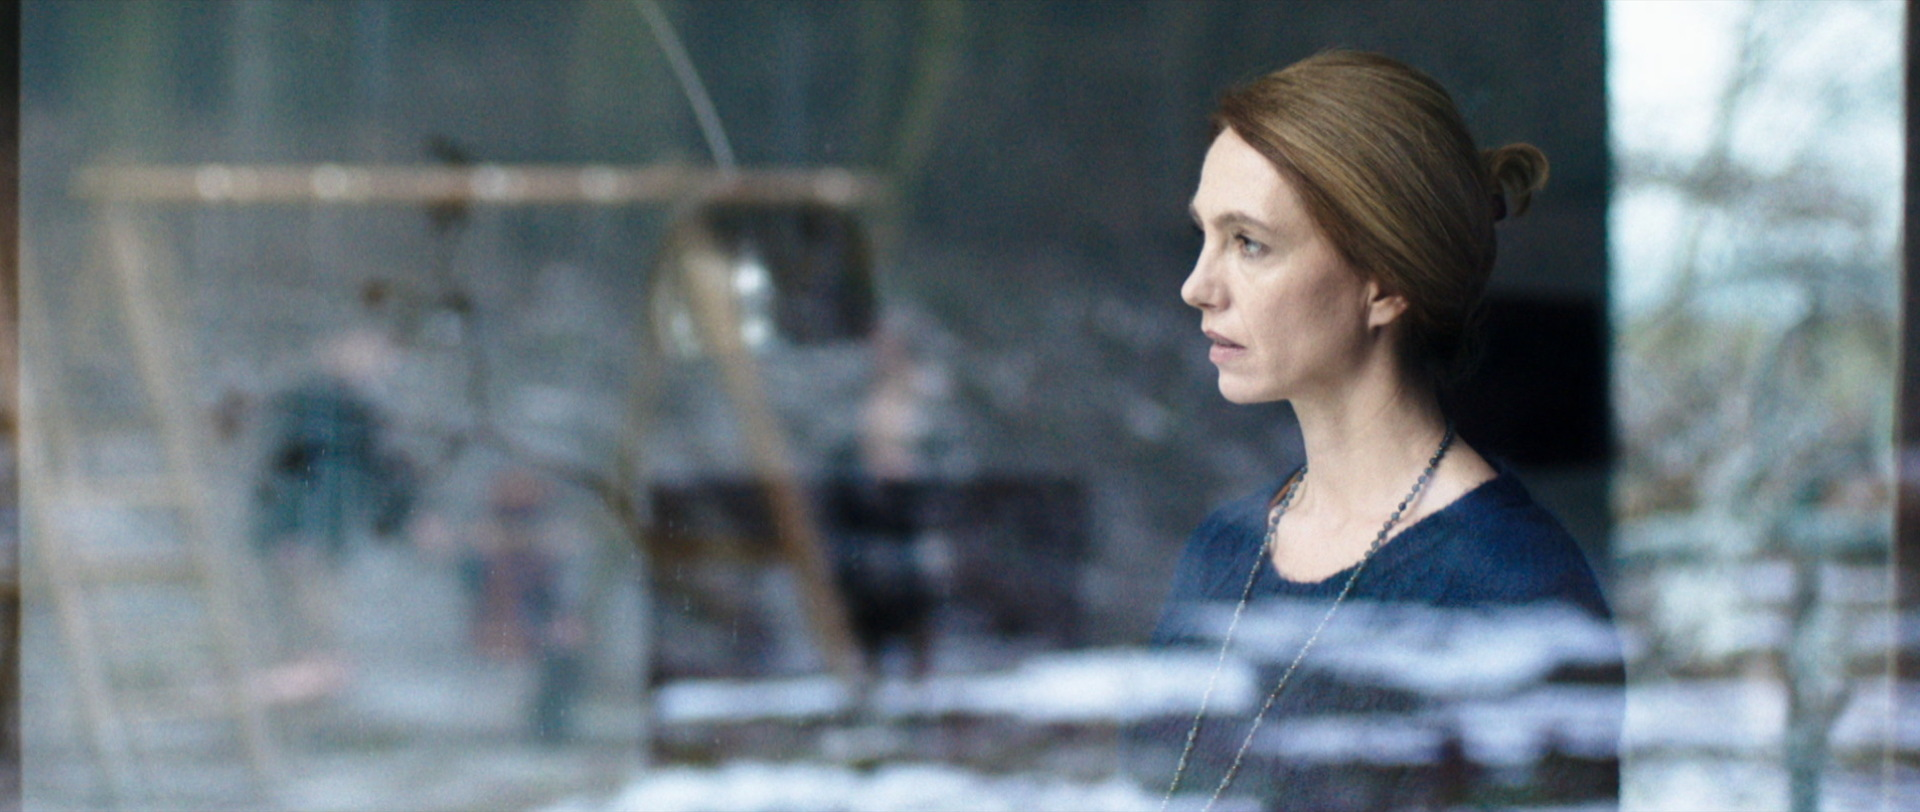 Traumland - Dreamland - Ursina Lardi spielt Lena - Regie Petra Volpe - Kamera Judith Kaufmann